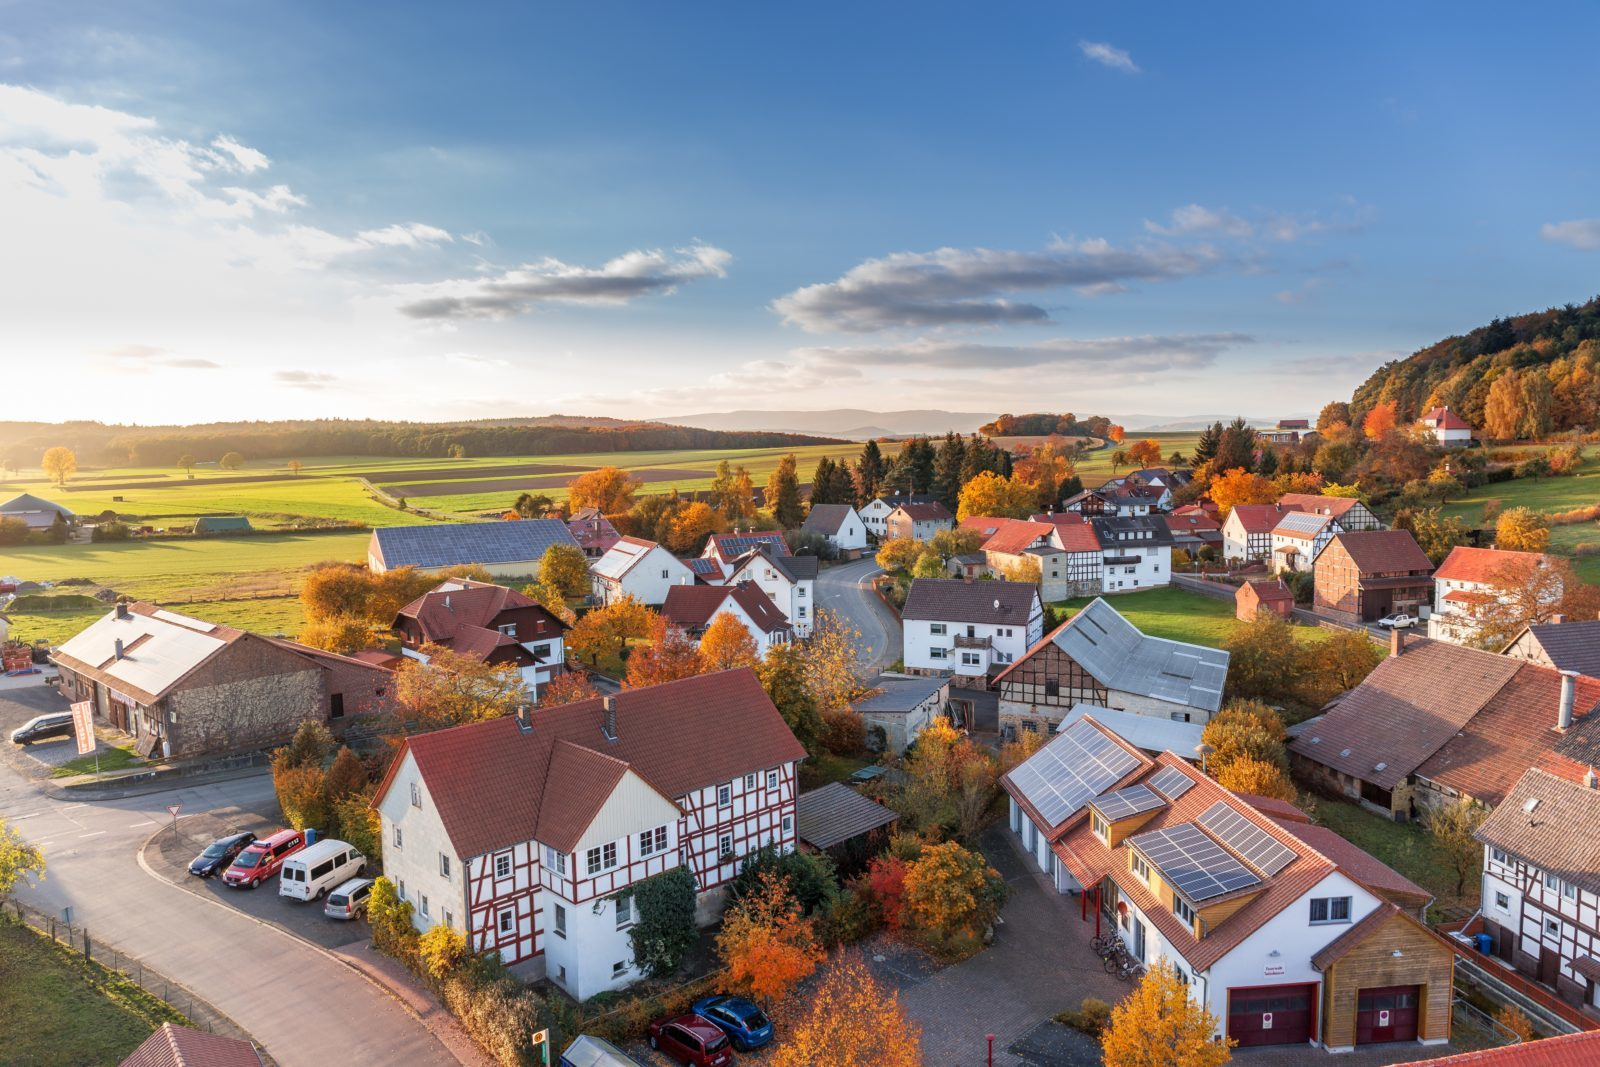 satelles mobilewebguide: Dorf App/ Bürger App